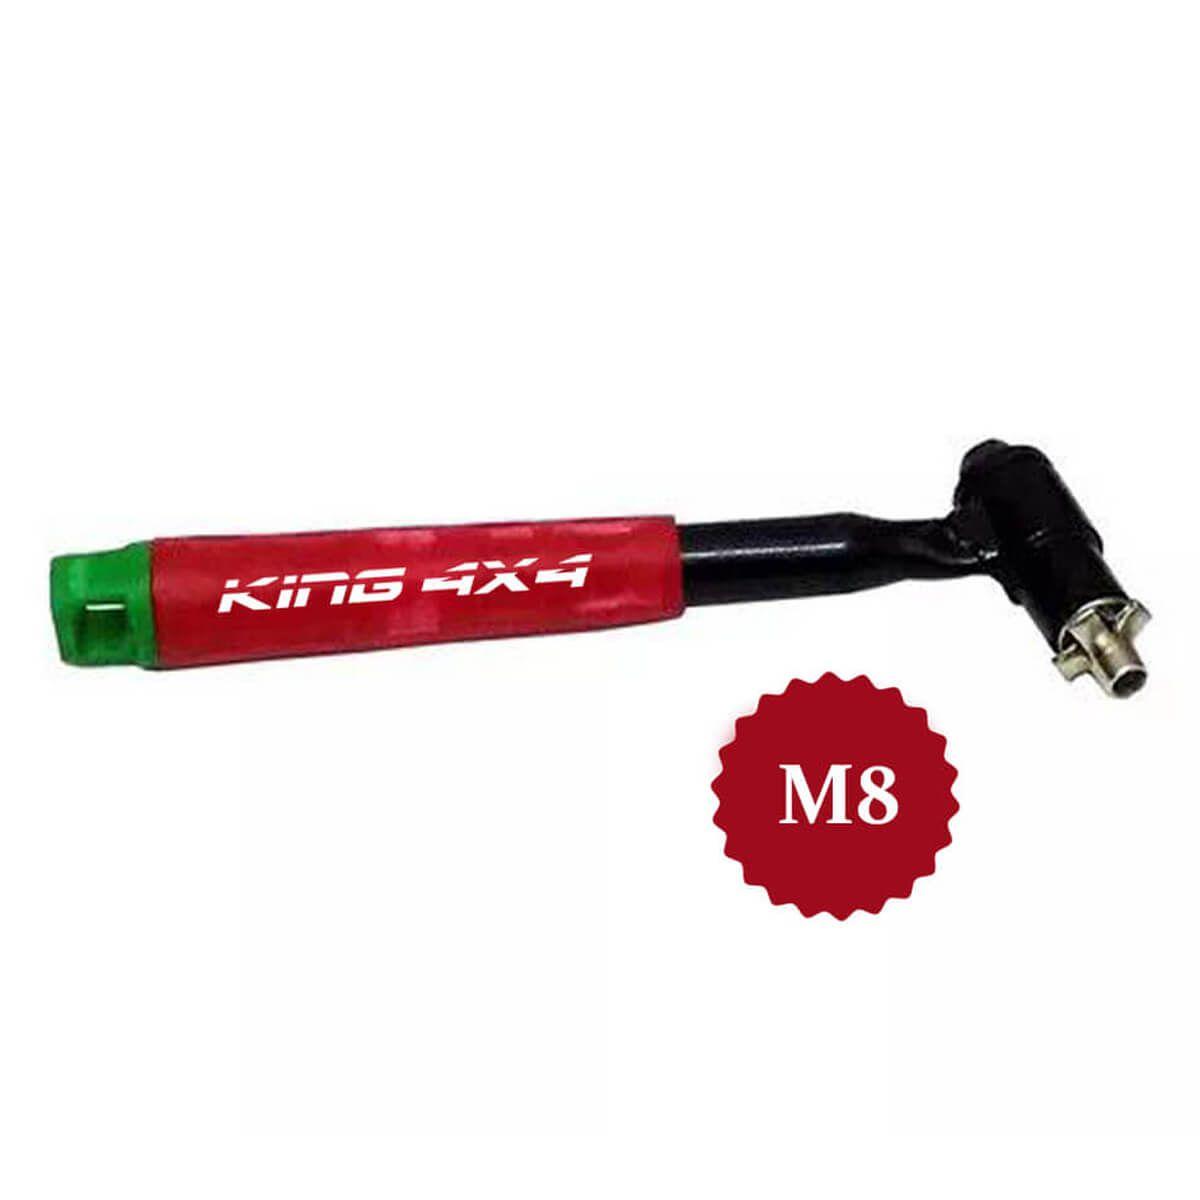 Rebitadeira KING 4x4 | M8 | Plusnut